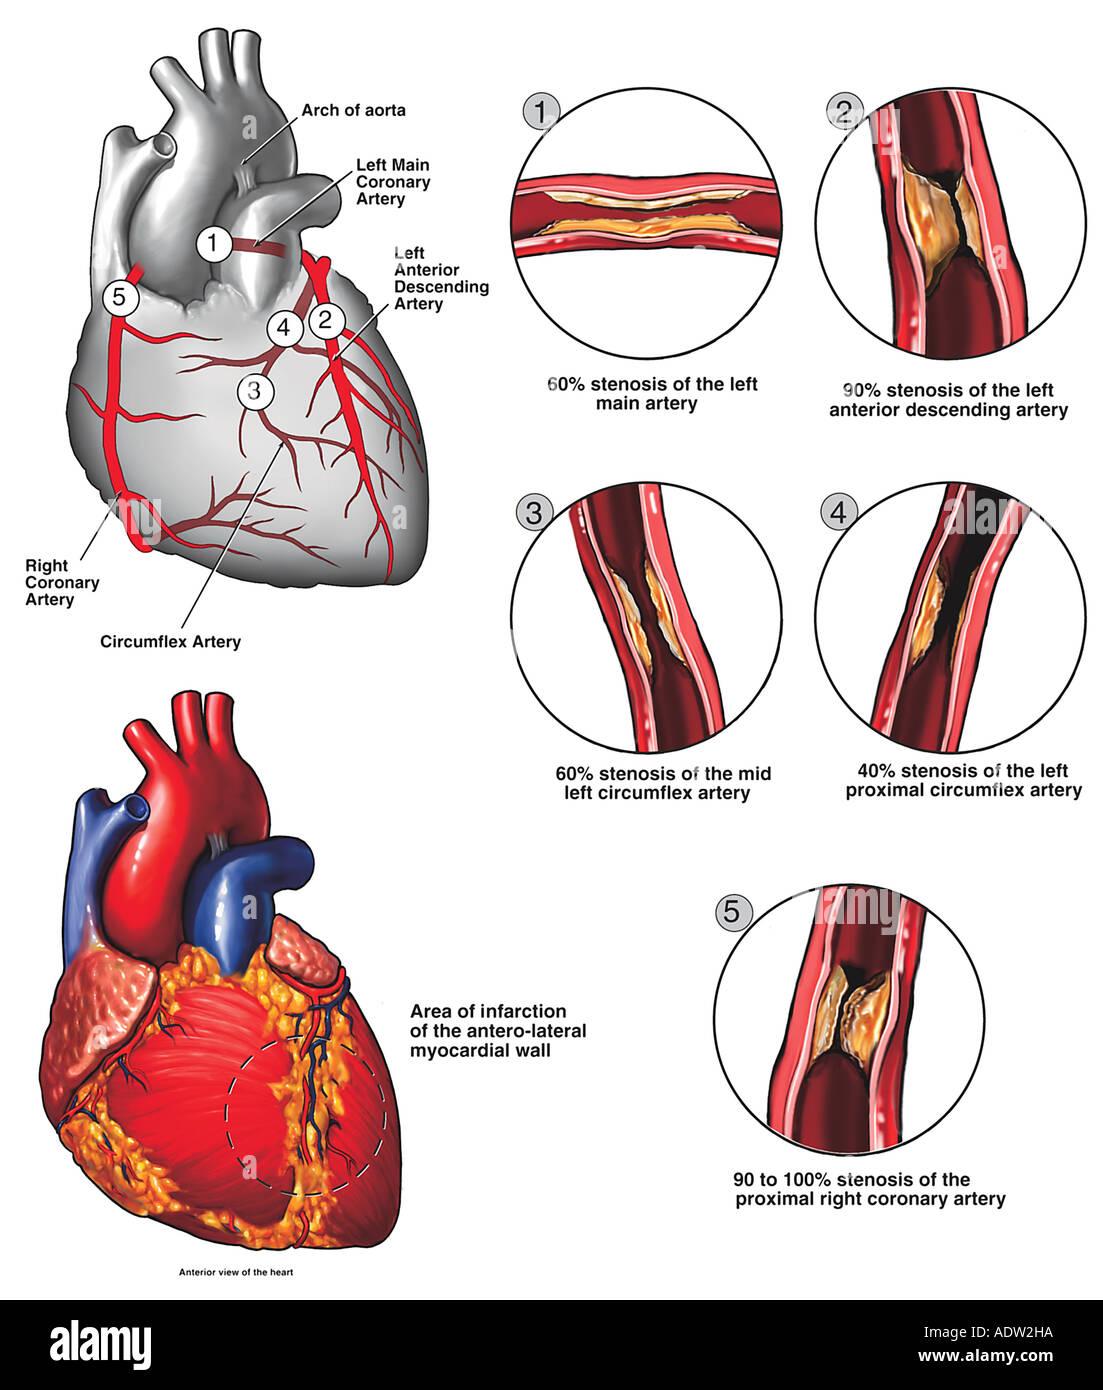 Atherosclerotic Coronary Artery Disease Stock Photo